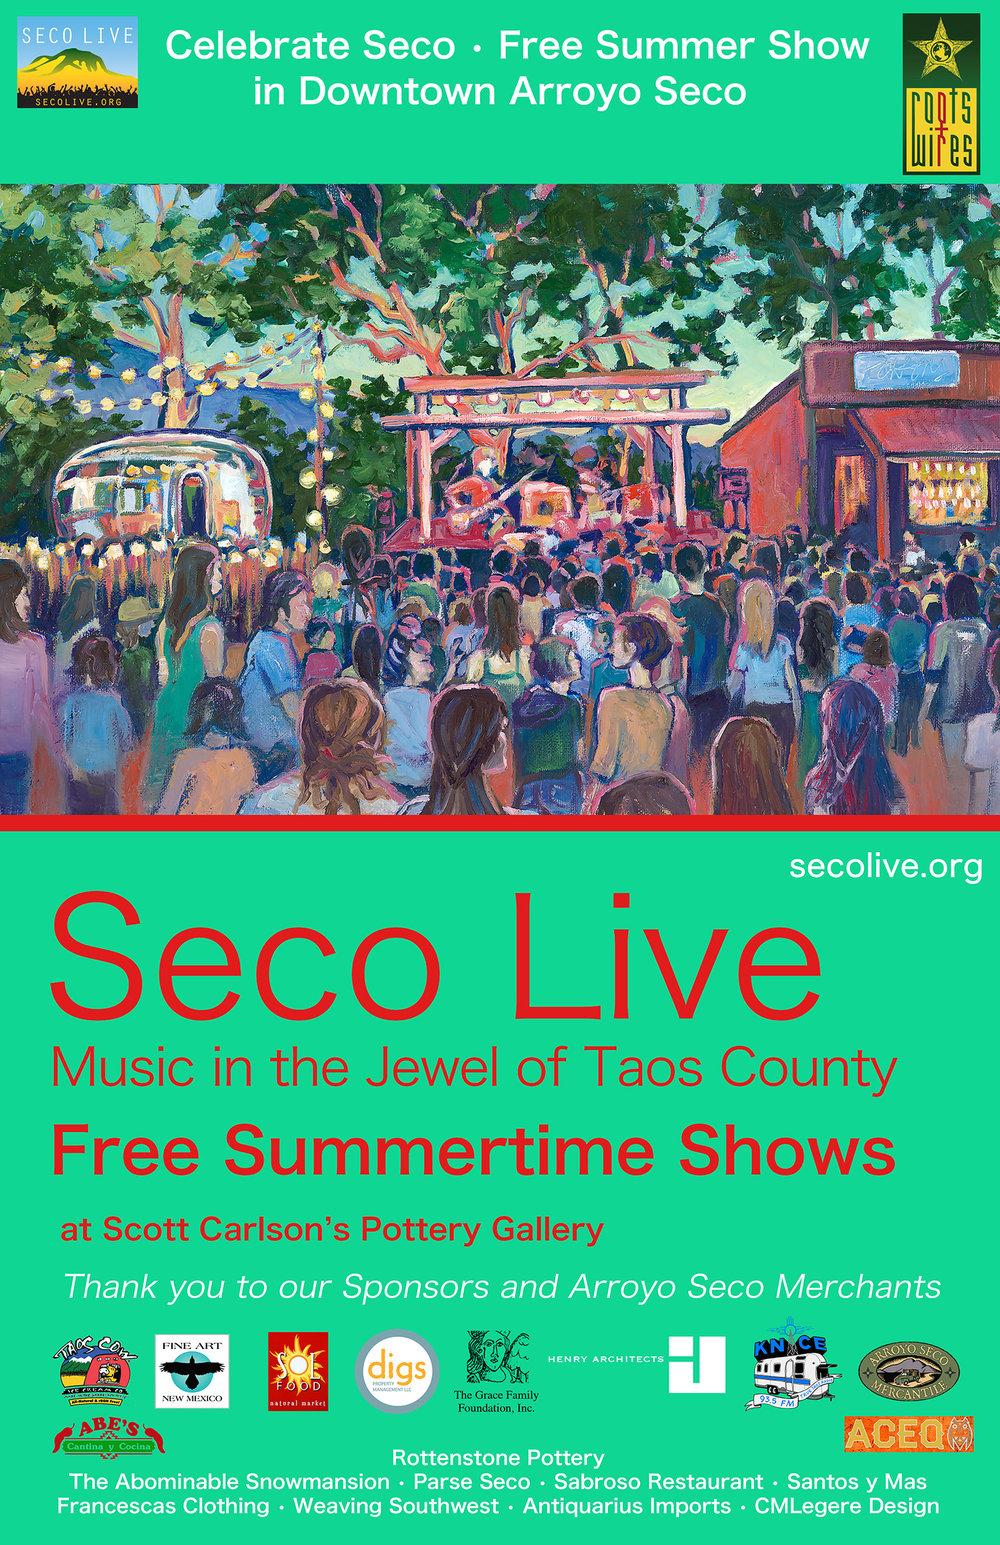 Seco_live_Sponsorship_Poster_web.jpg